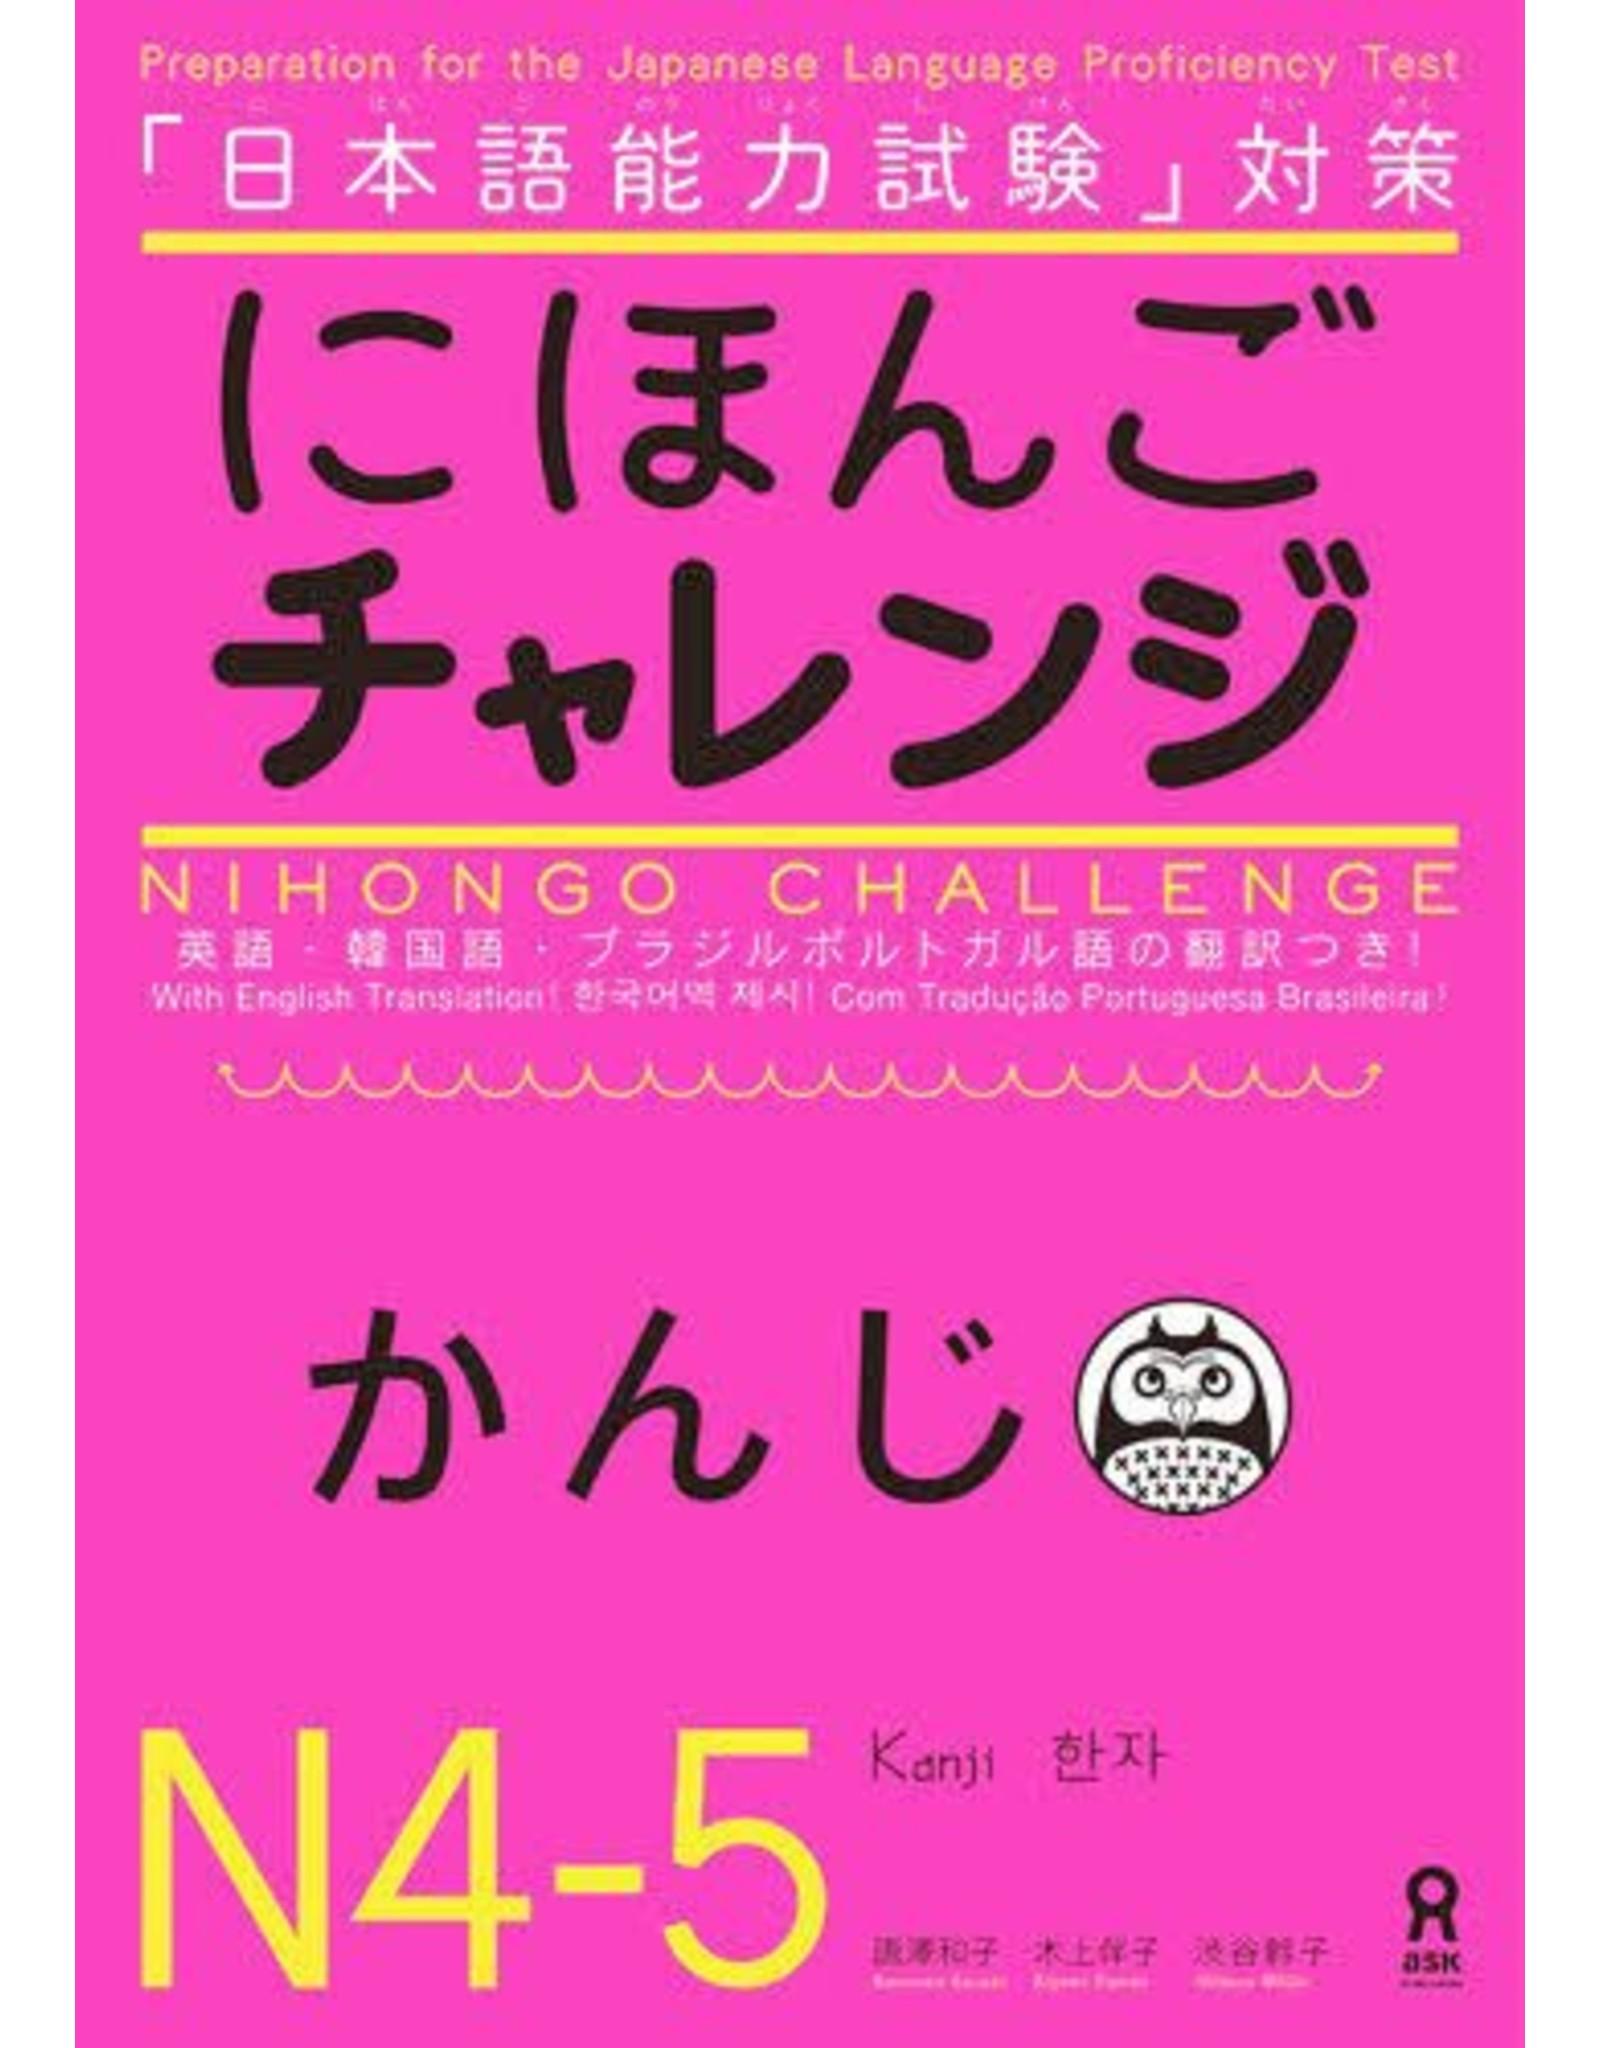 ASK NIHONGO CHALLENGE KANJI N4 -5 : PREPARATION FOR JLPT WITH ENGLISH TRANSLATION